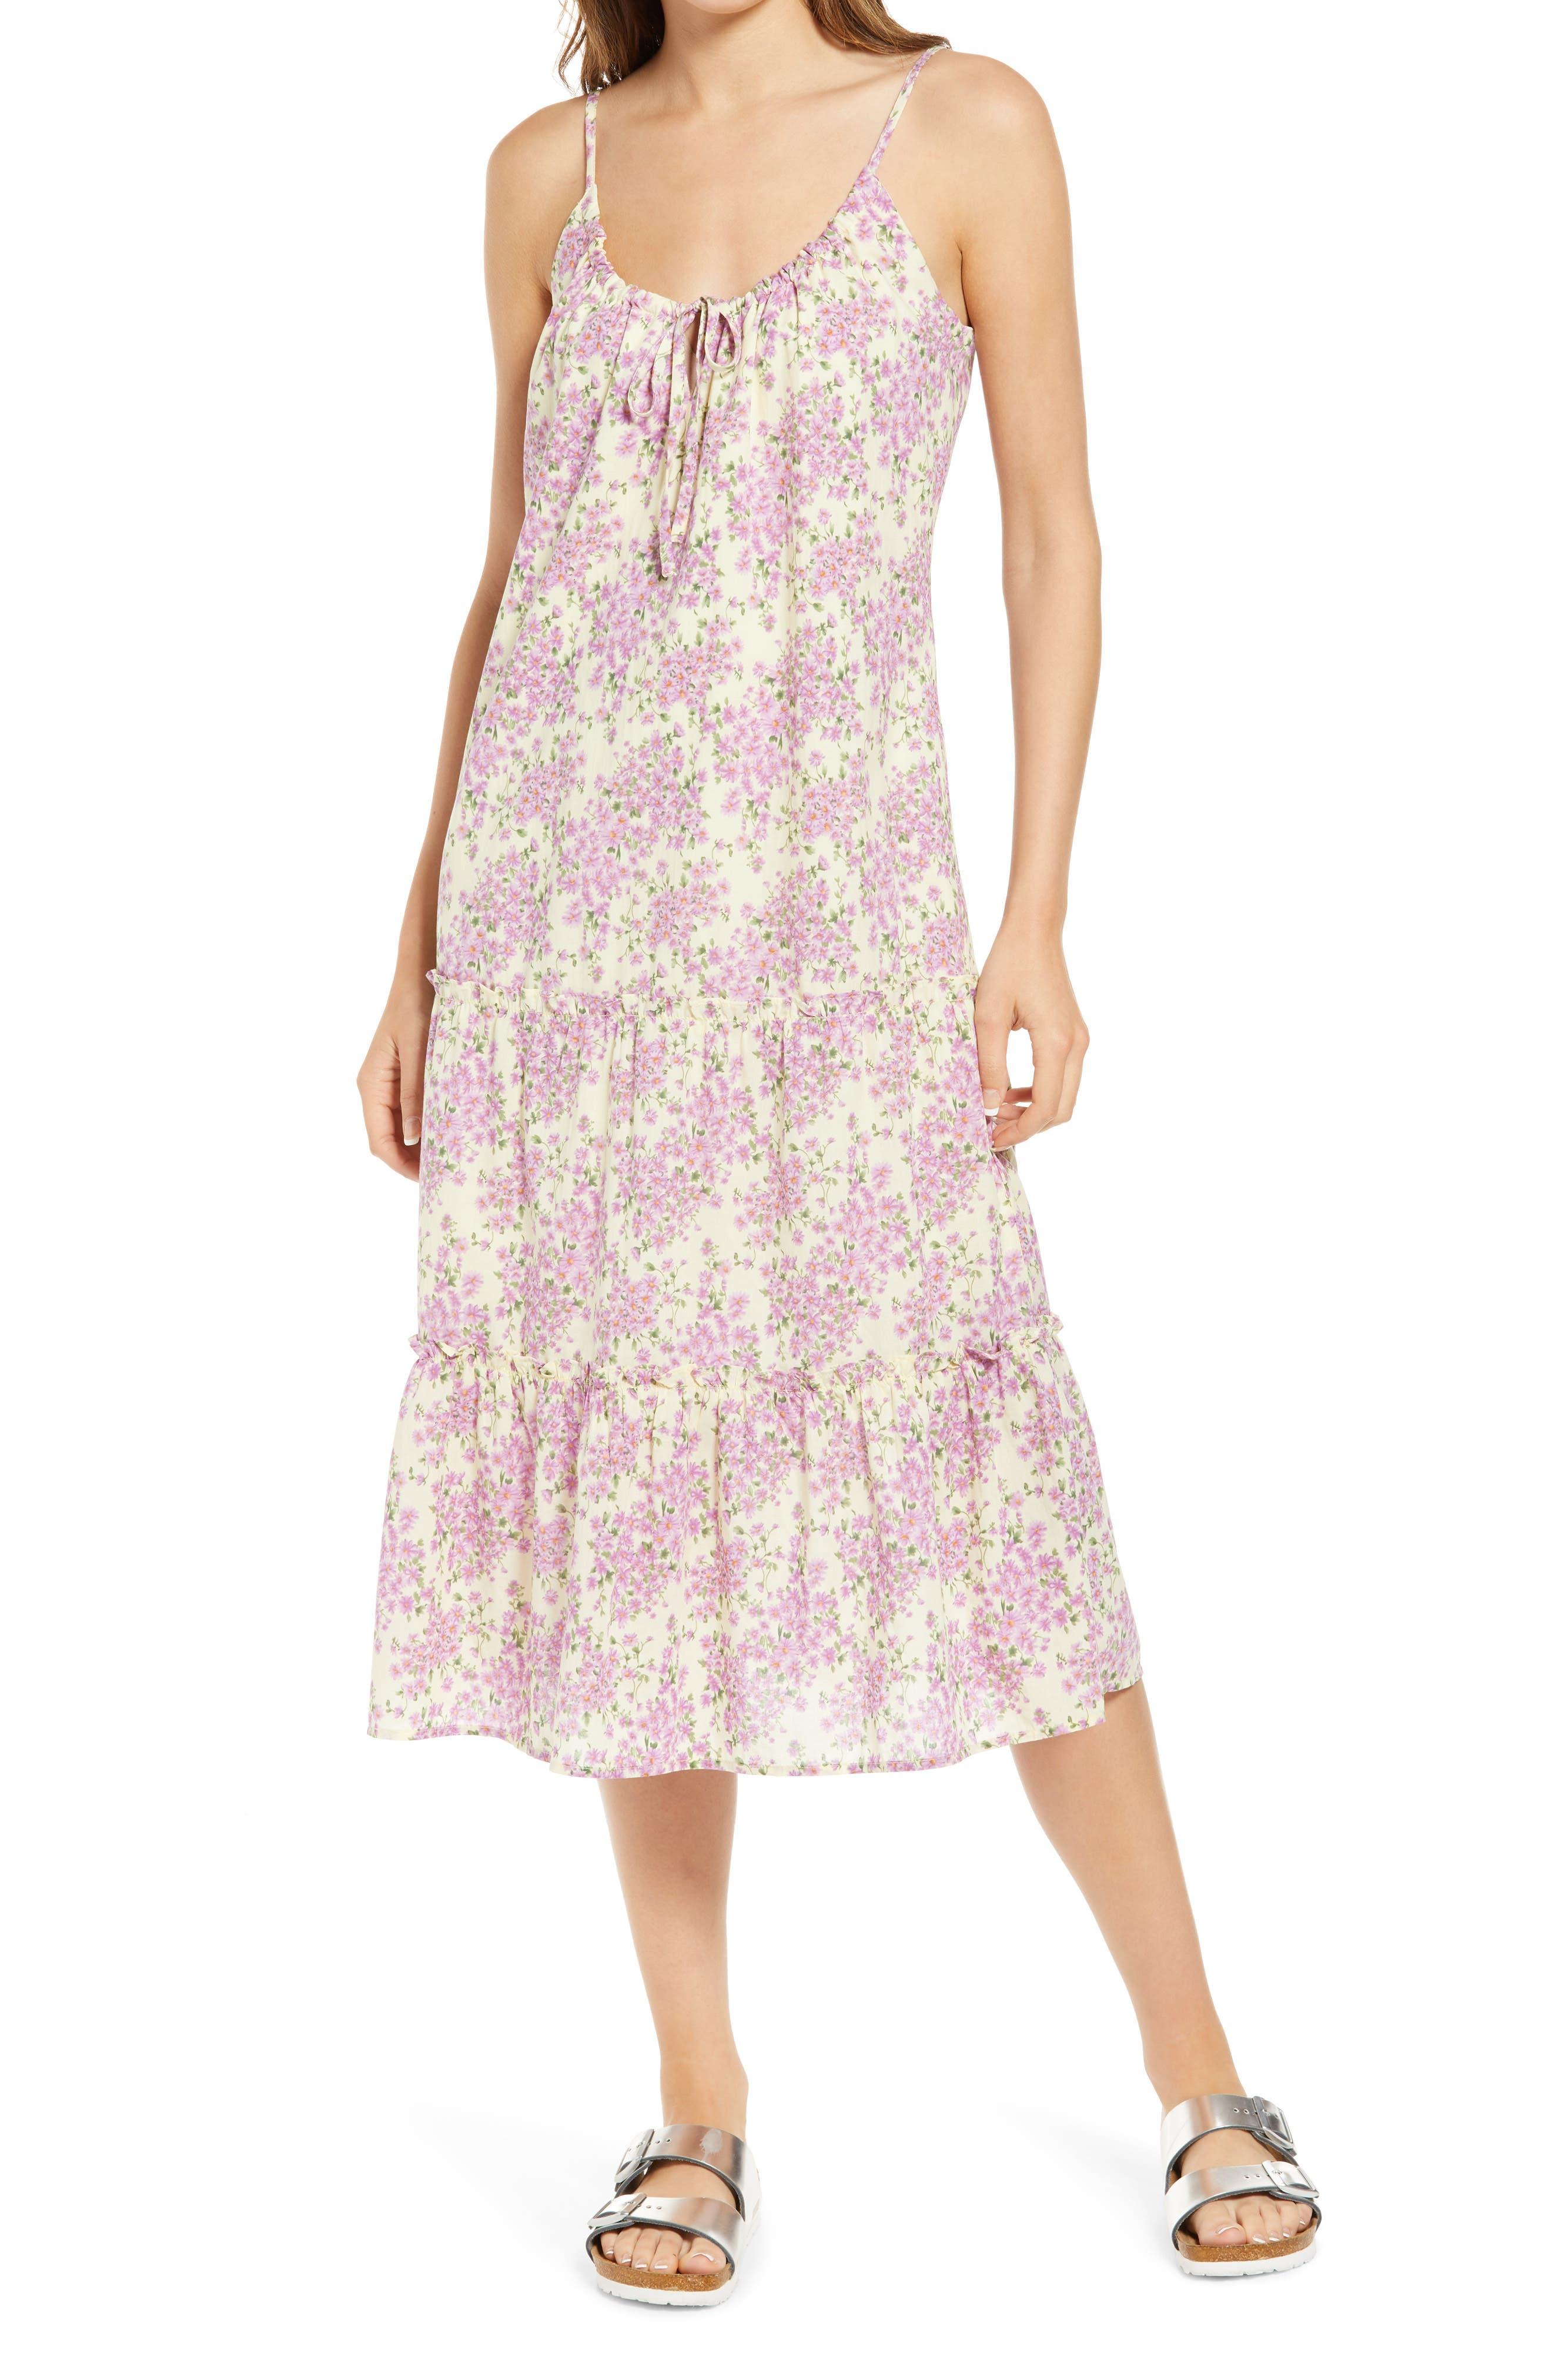 Stasi Floral Cotton Sundress